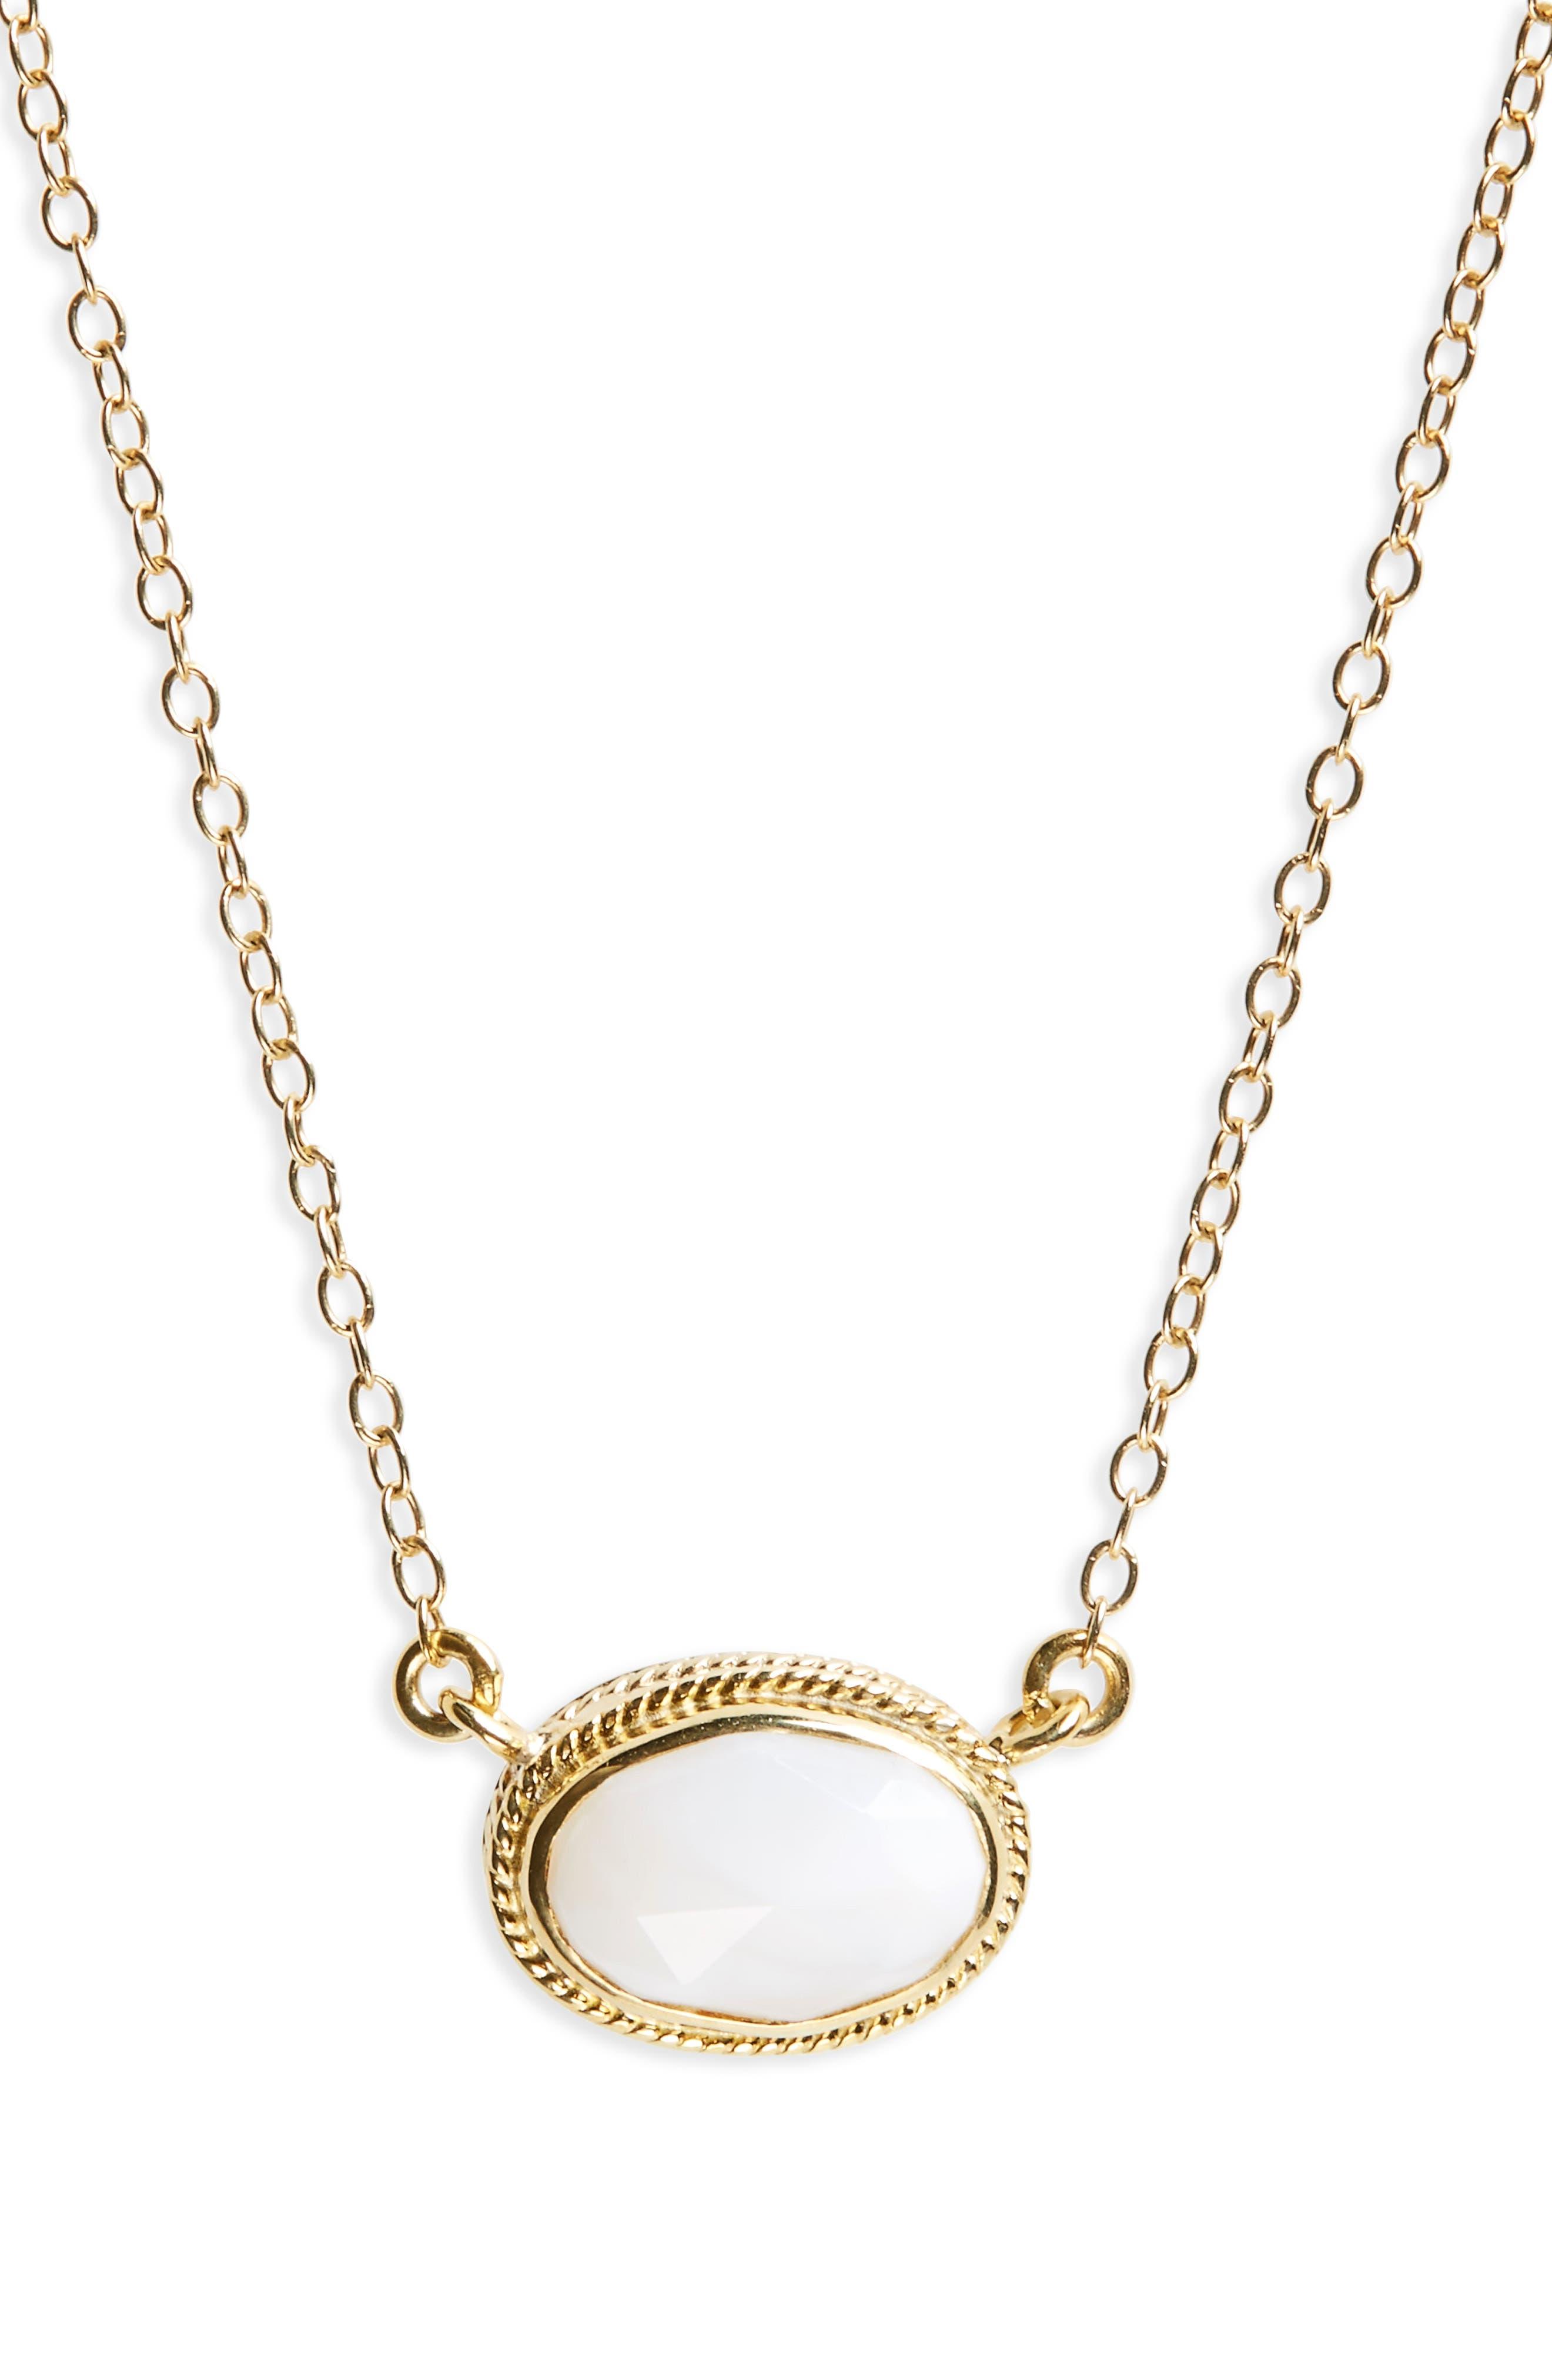 White Opal Pendant Necklace,                         Main,                         color, Gold/ Silver